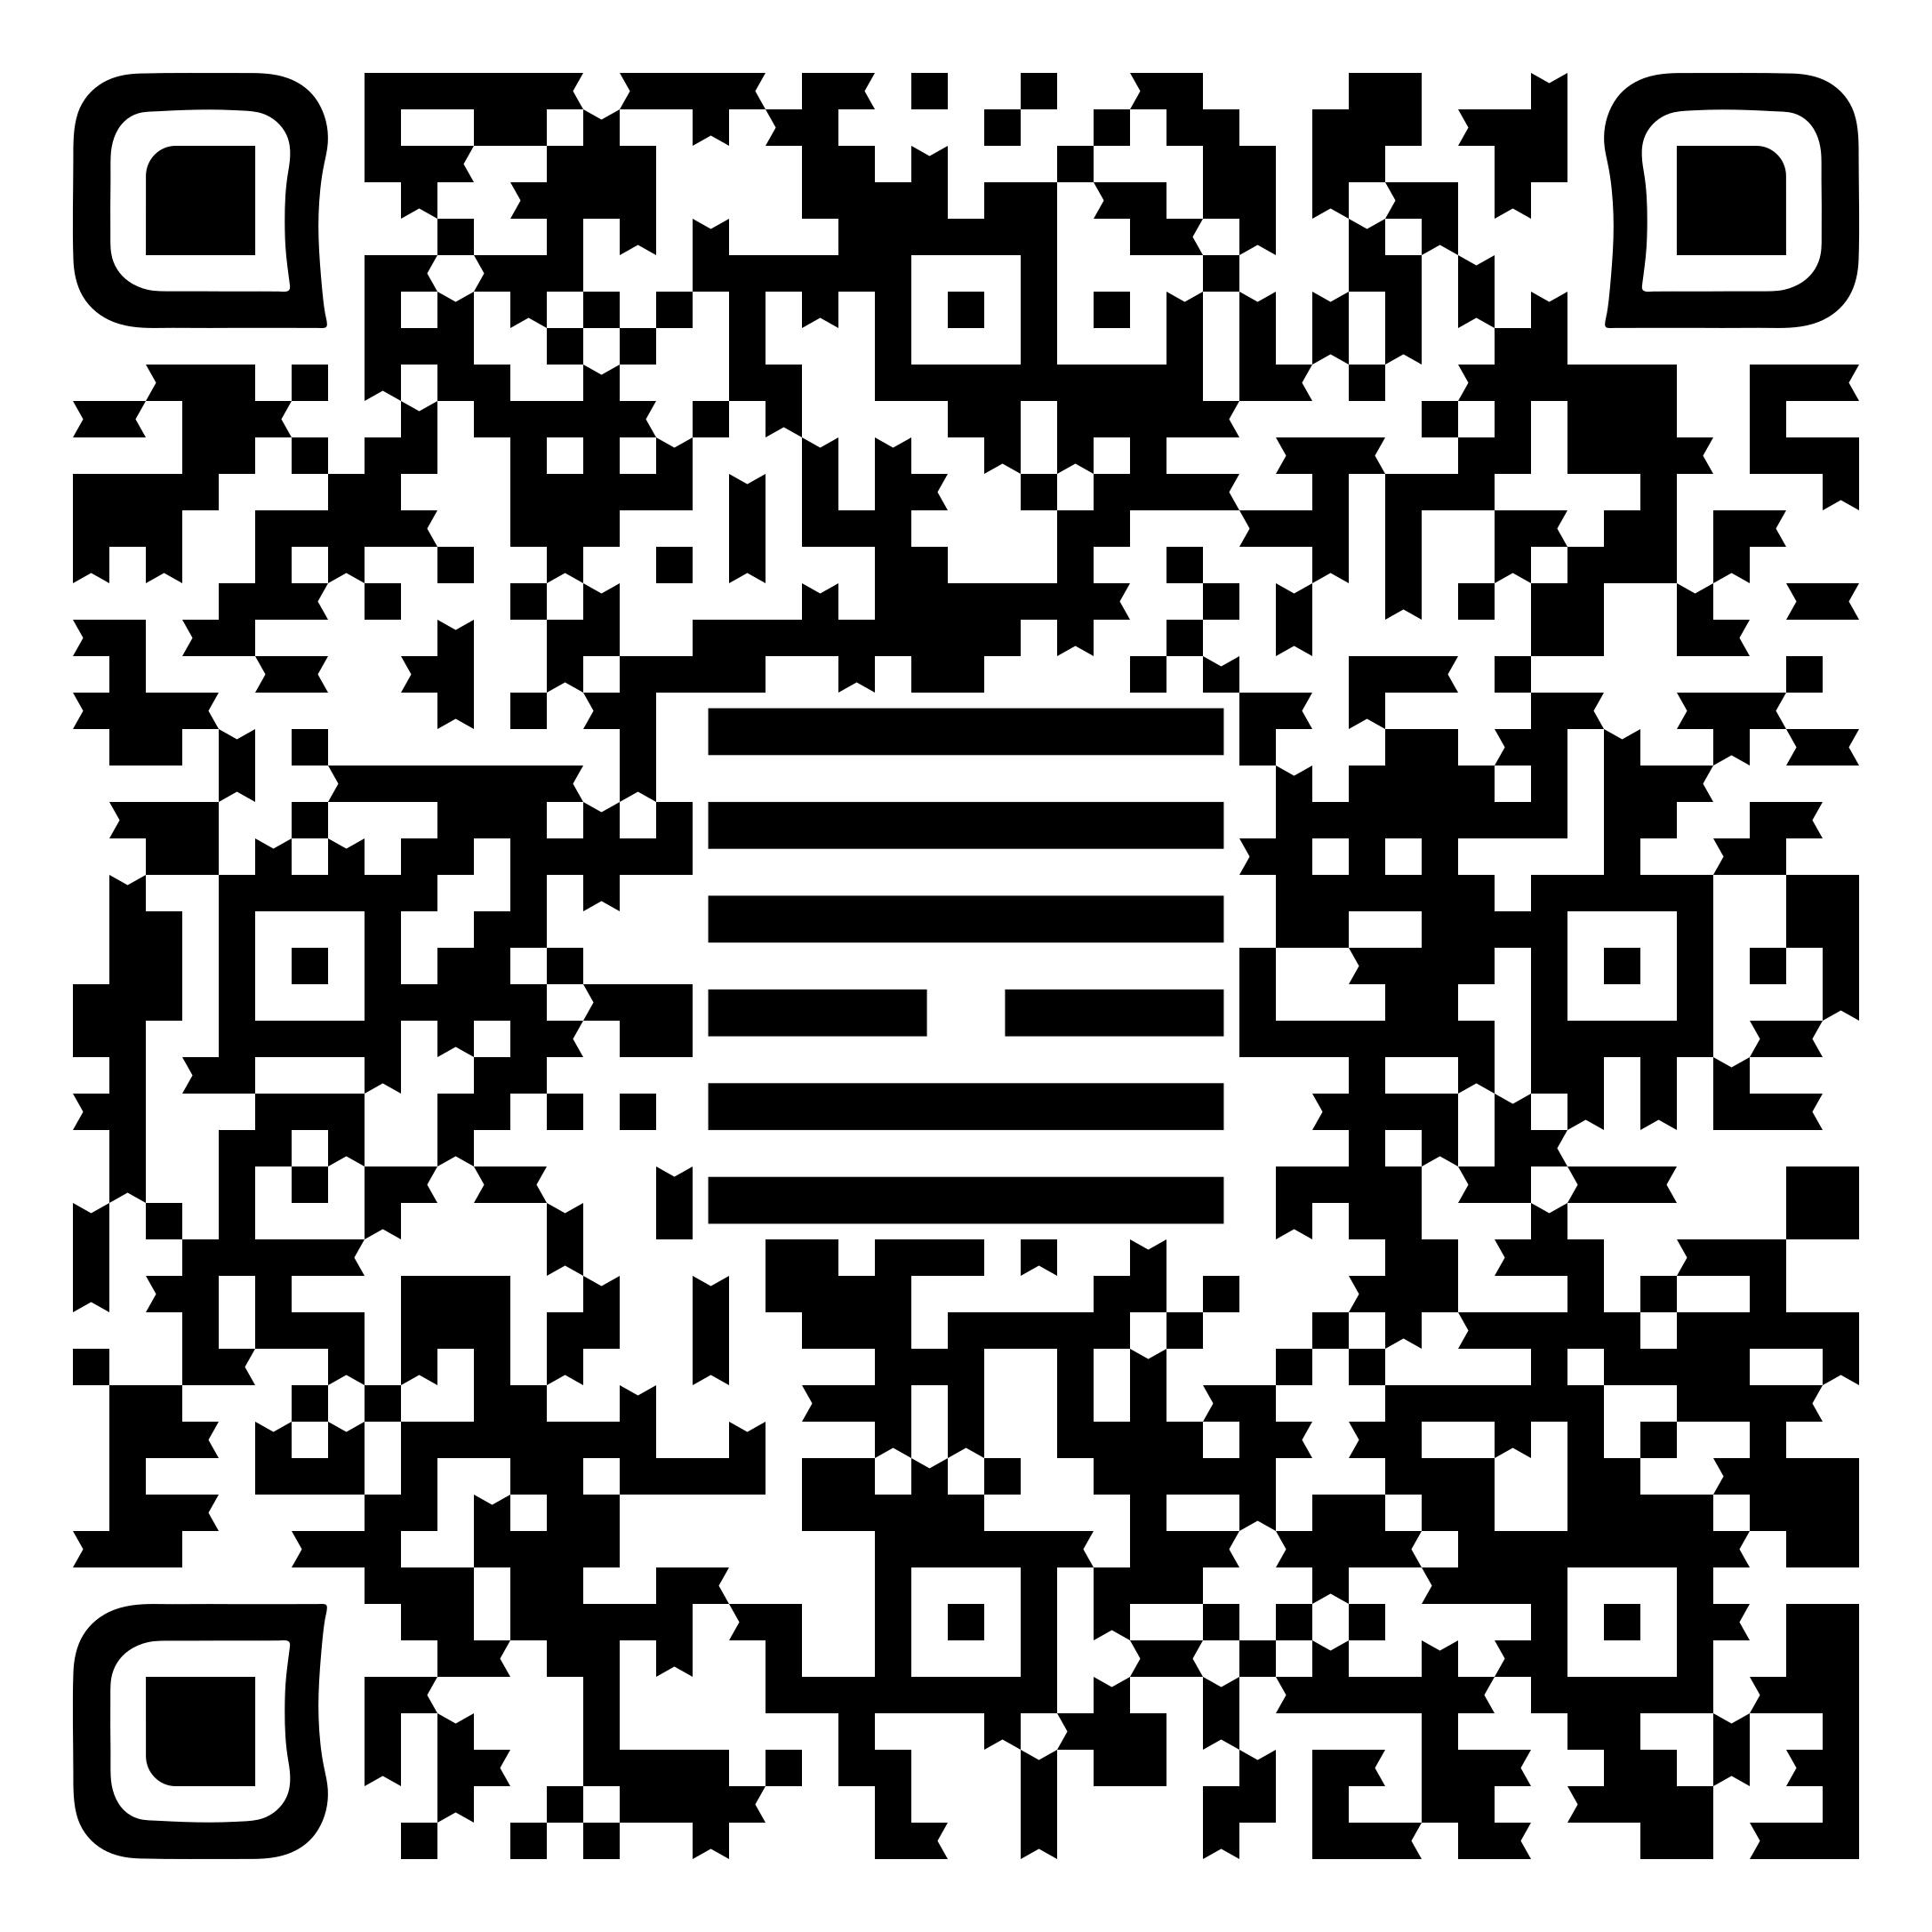 qr-code-10.png